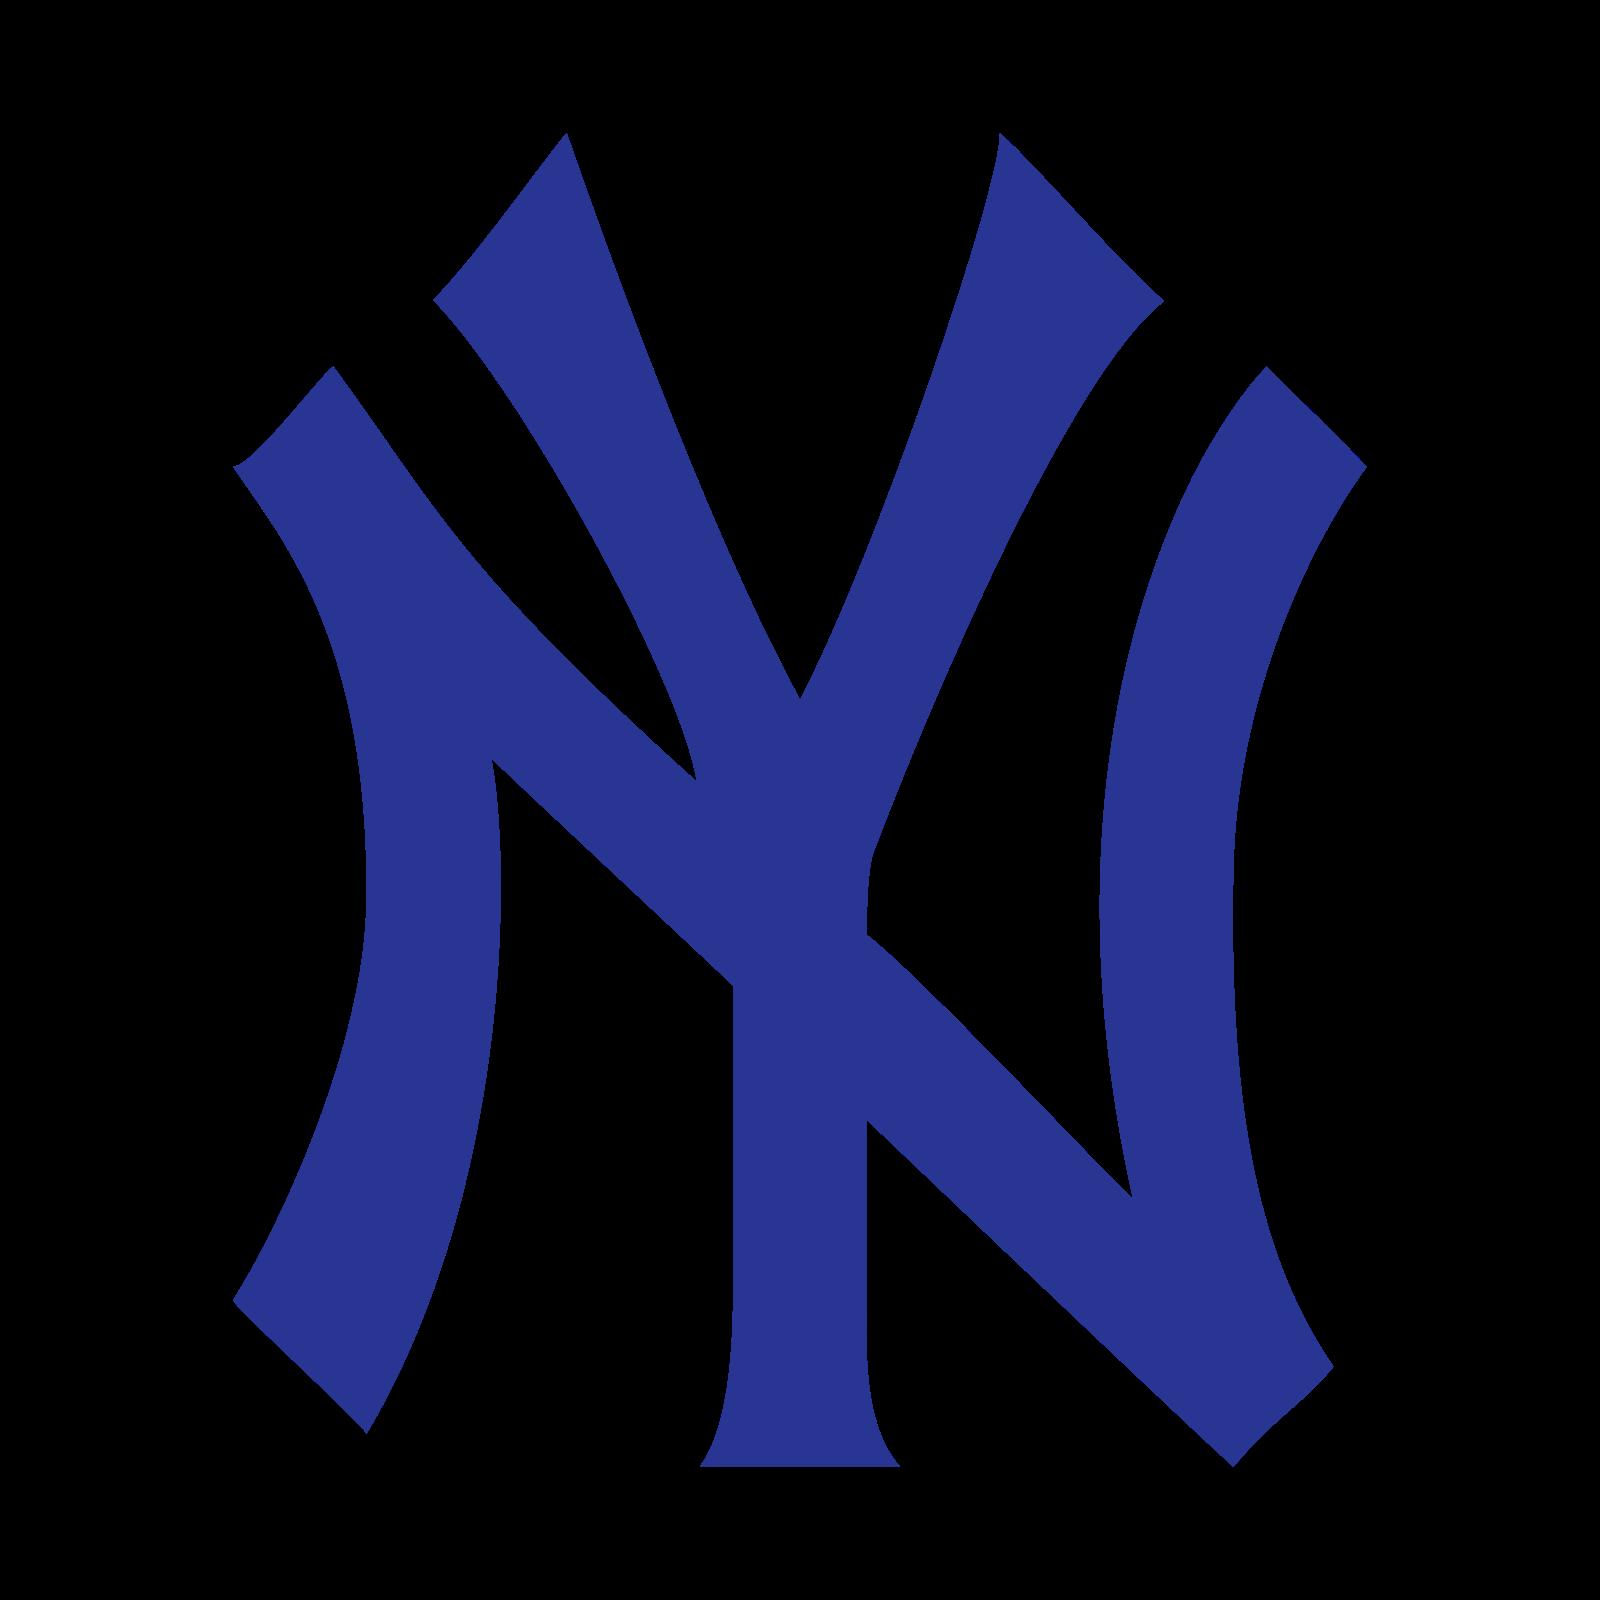 New York Yankees icon